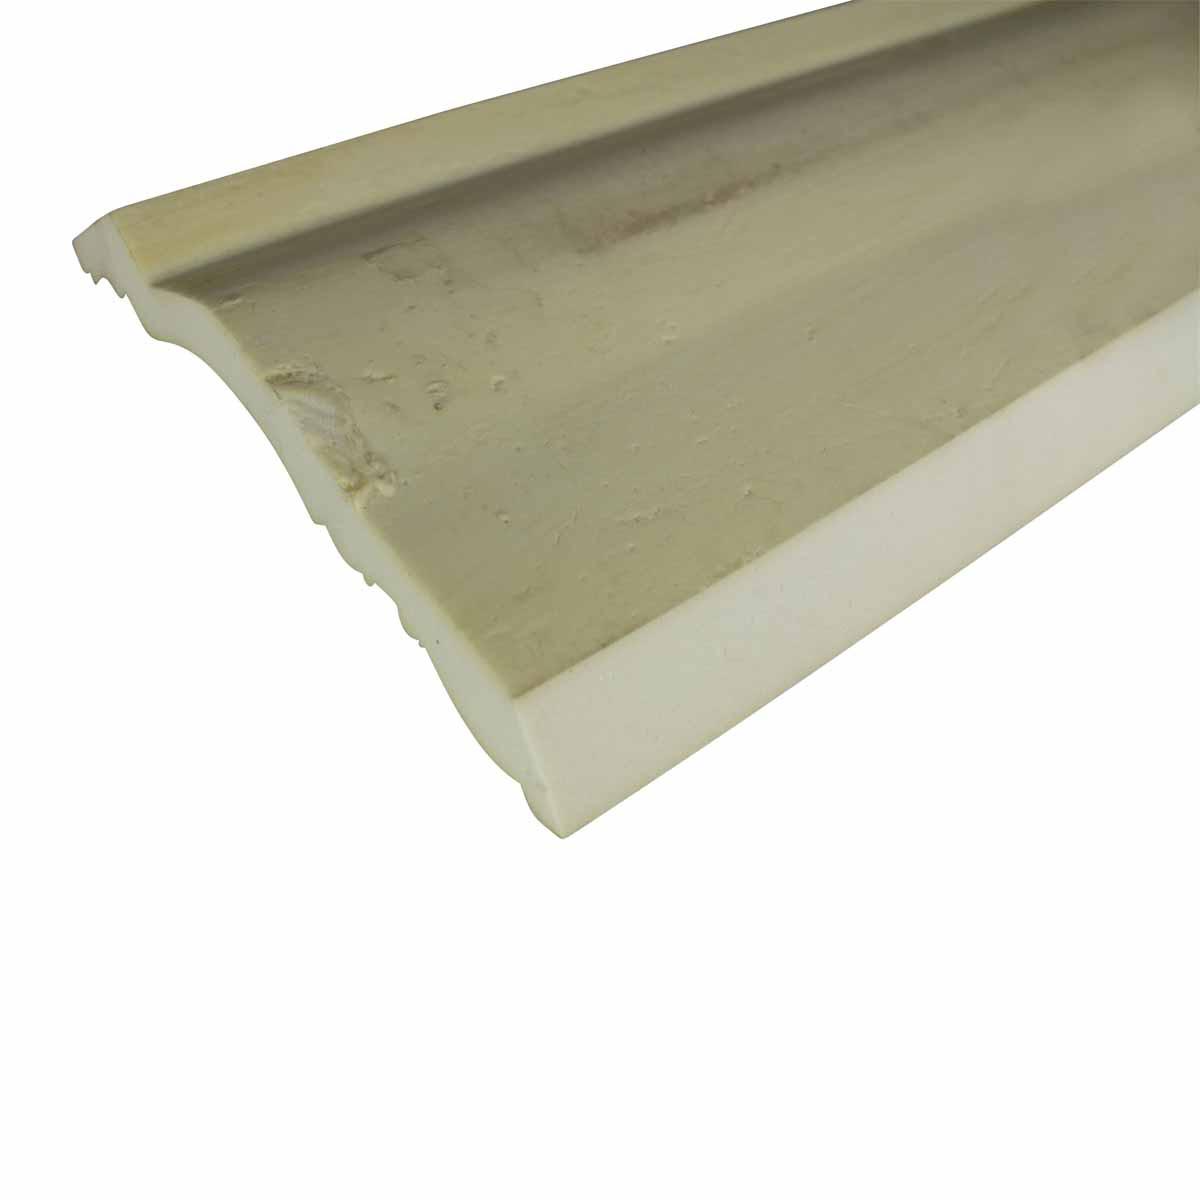 Cornice White Urethane Sample of 10980 23.5 Long Cornice Cornice Moulding Cornice Molding